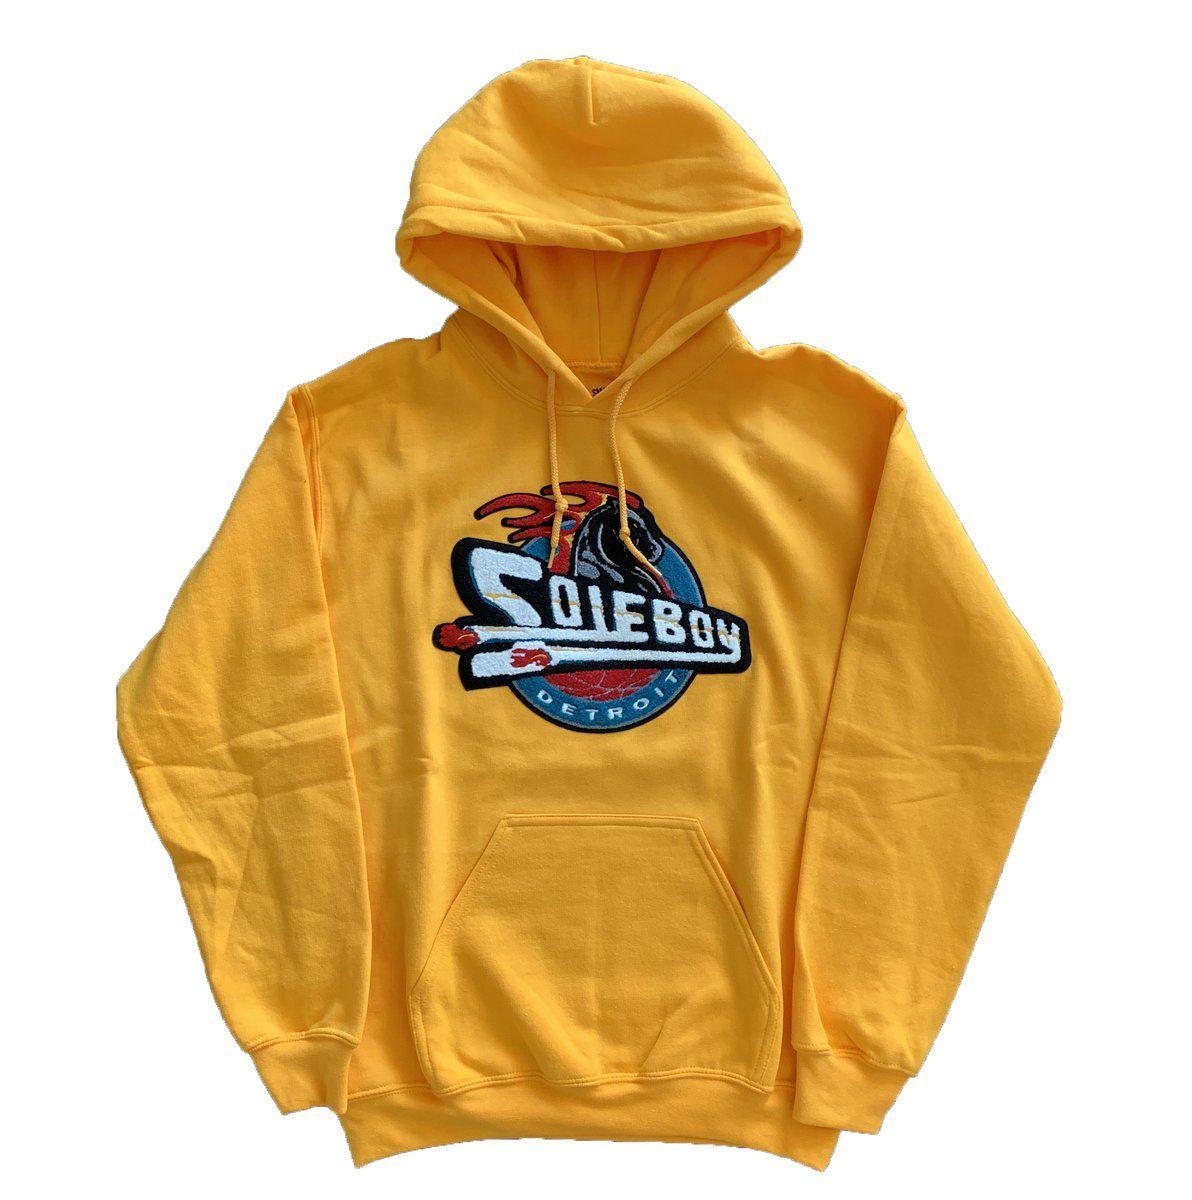 Fury Flame (YELLOW) SoleBoy Apparel Sweatshirts